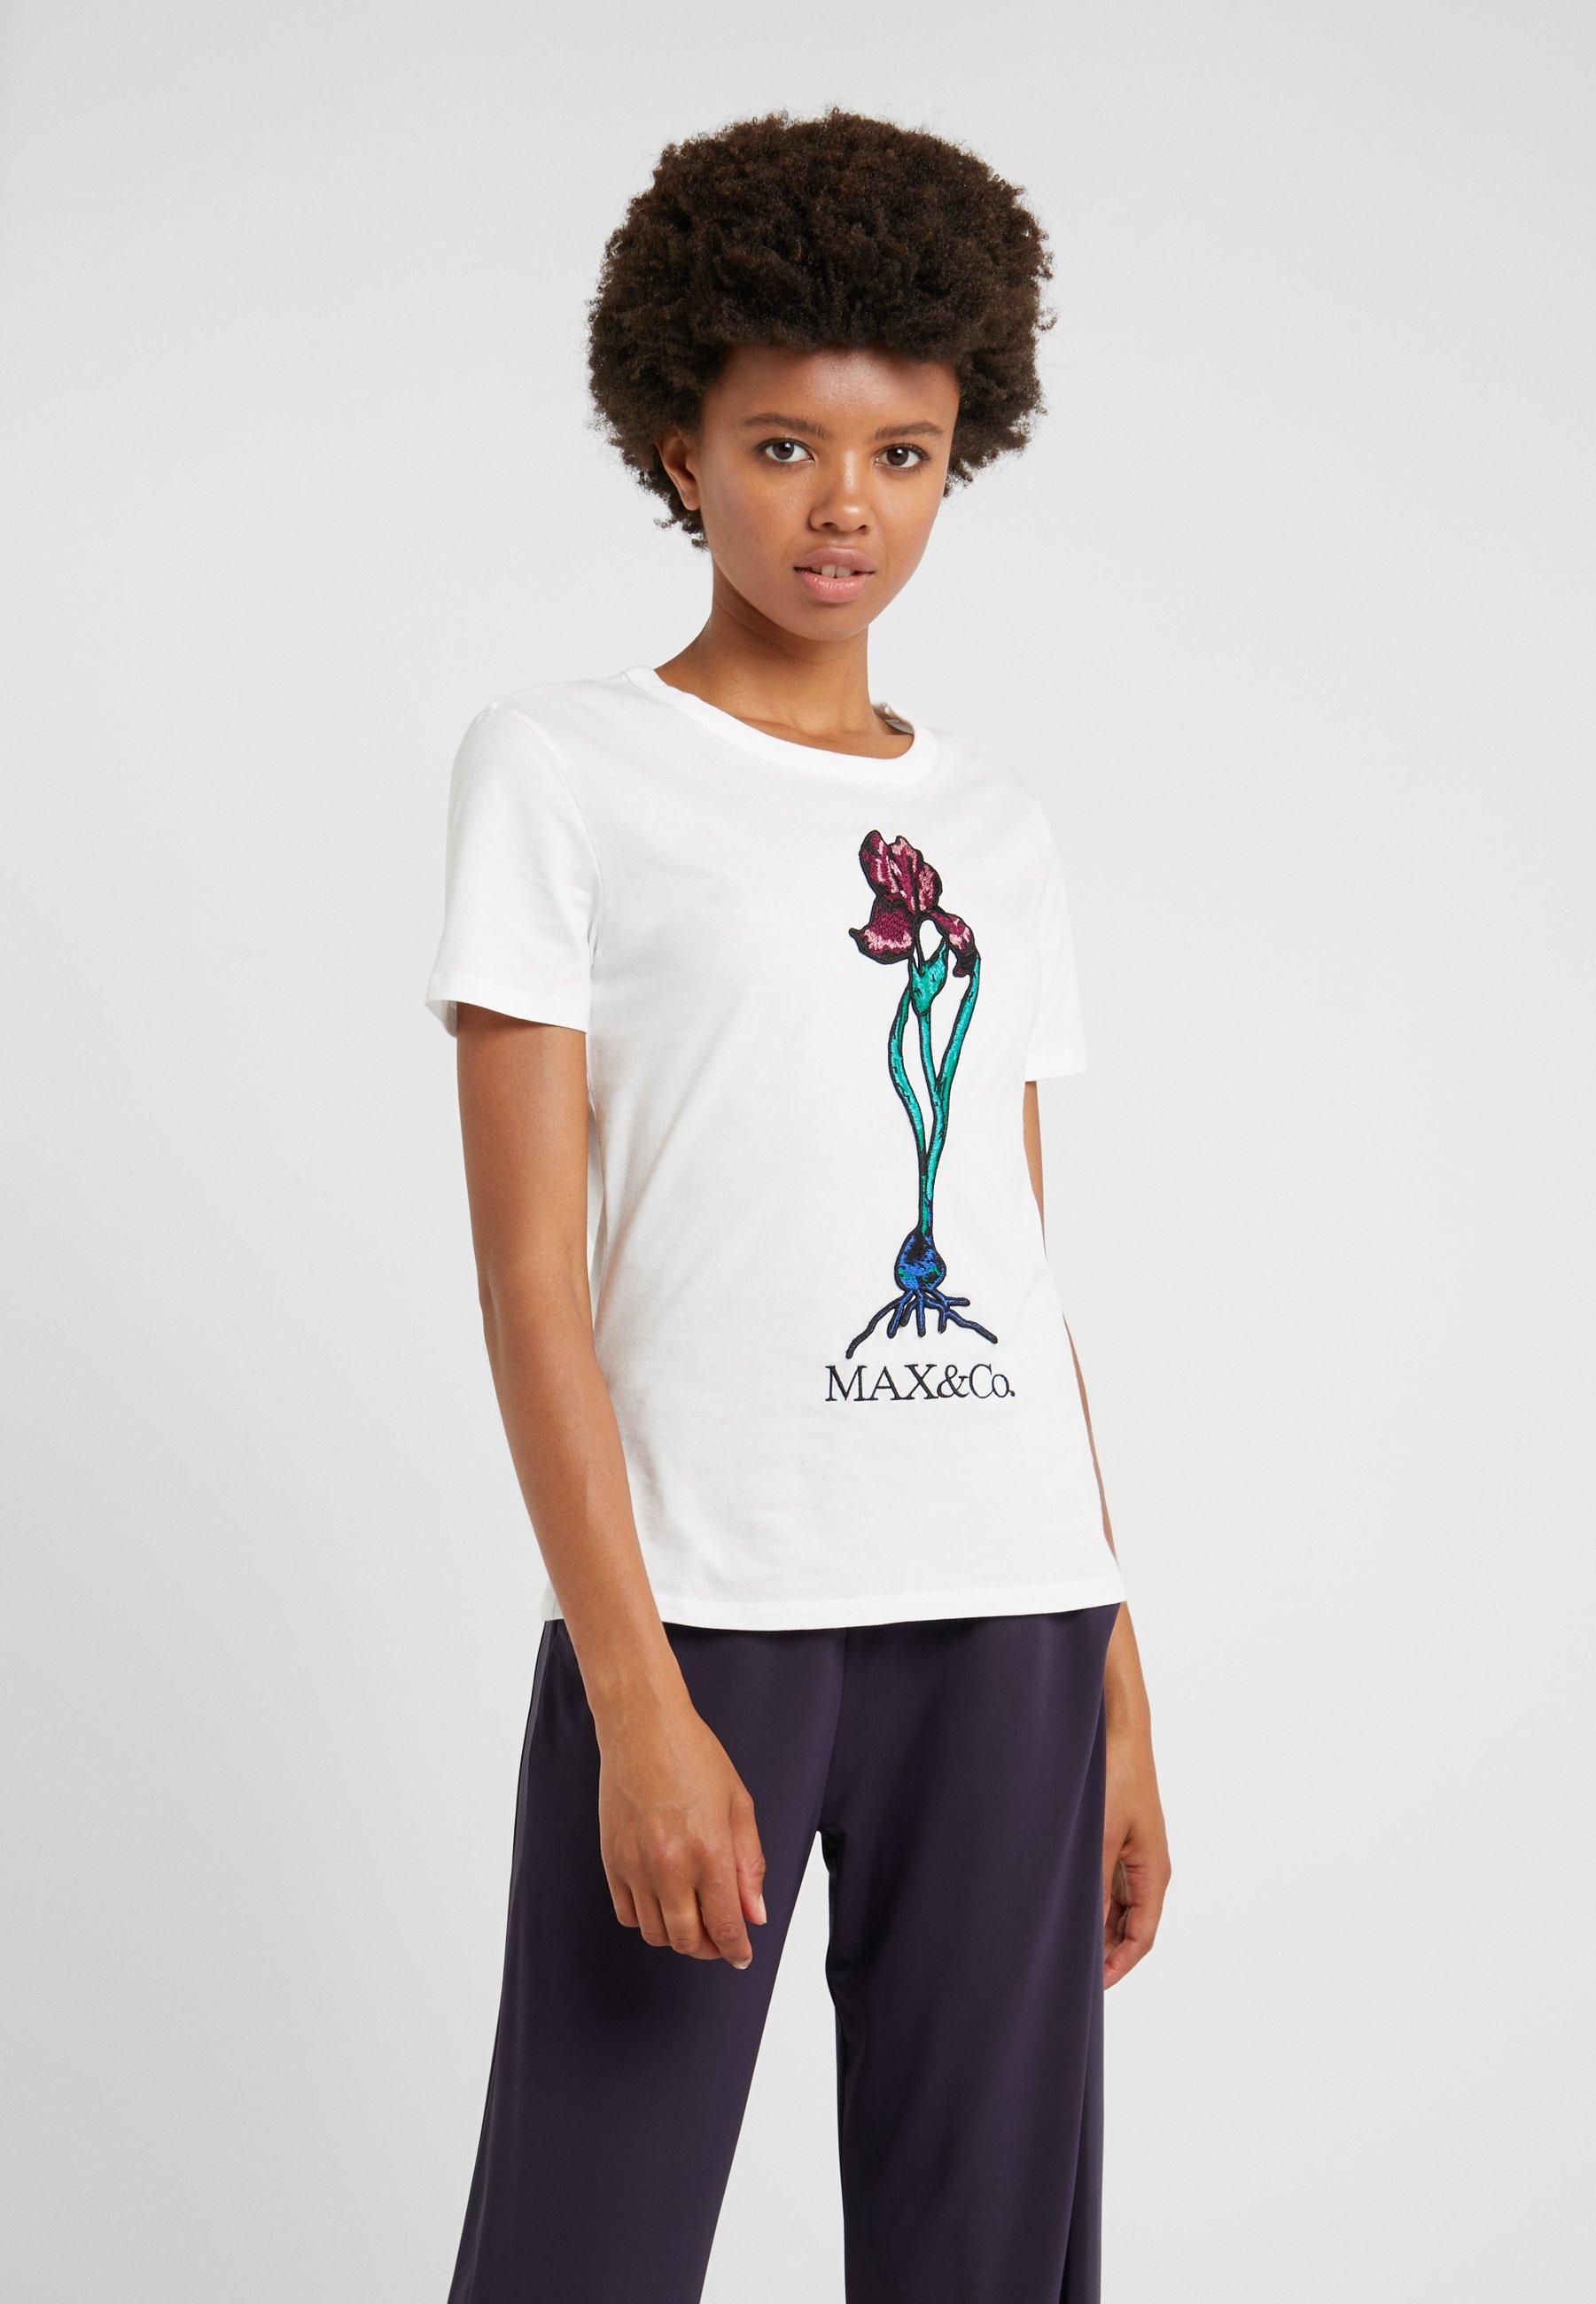 amp;coDoppiereT shirt shirt Imprimé Max Max Imprimé Ivory amp;coDoppiereT Max Ivory JlKF1Tc